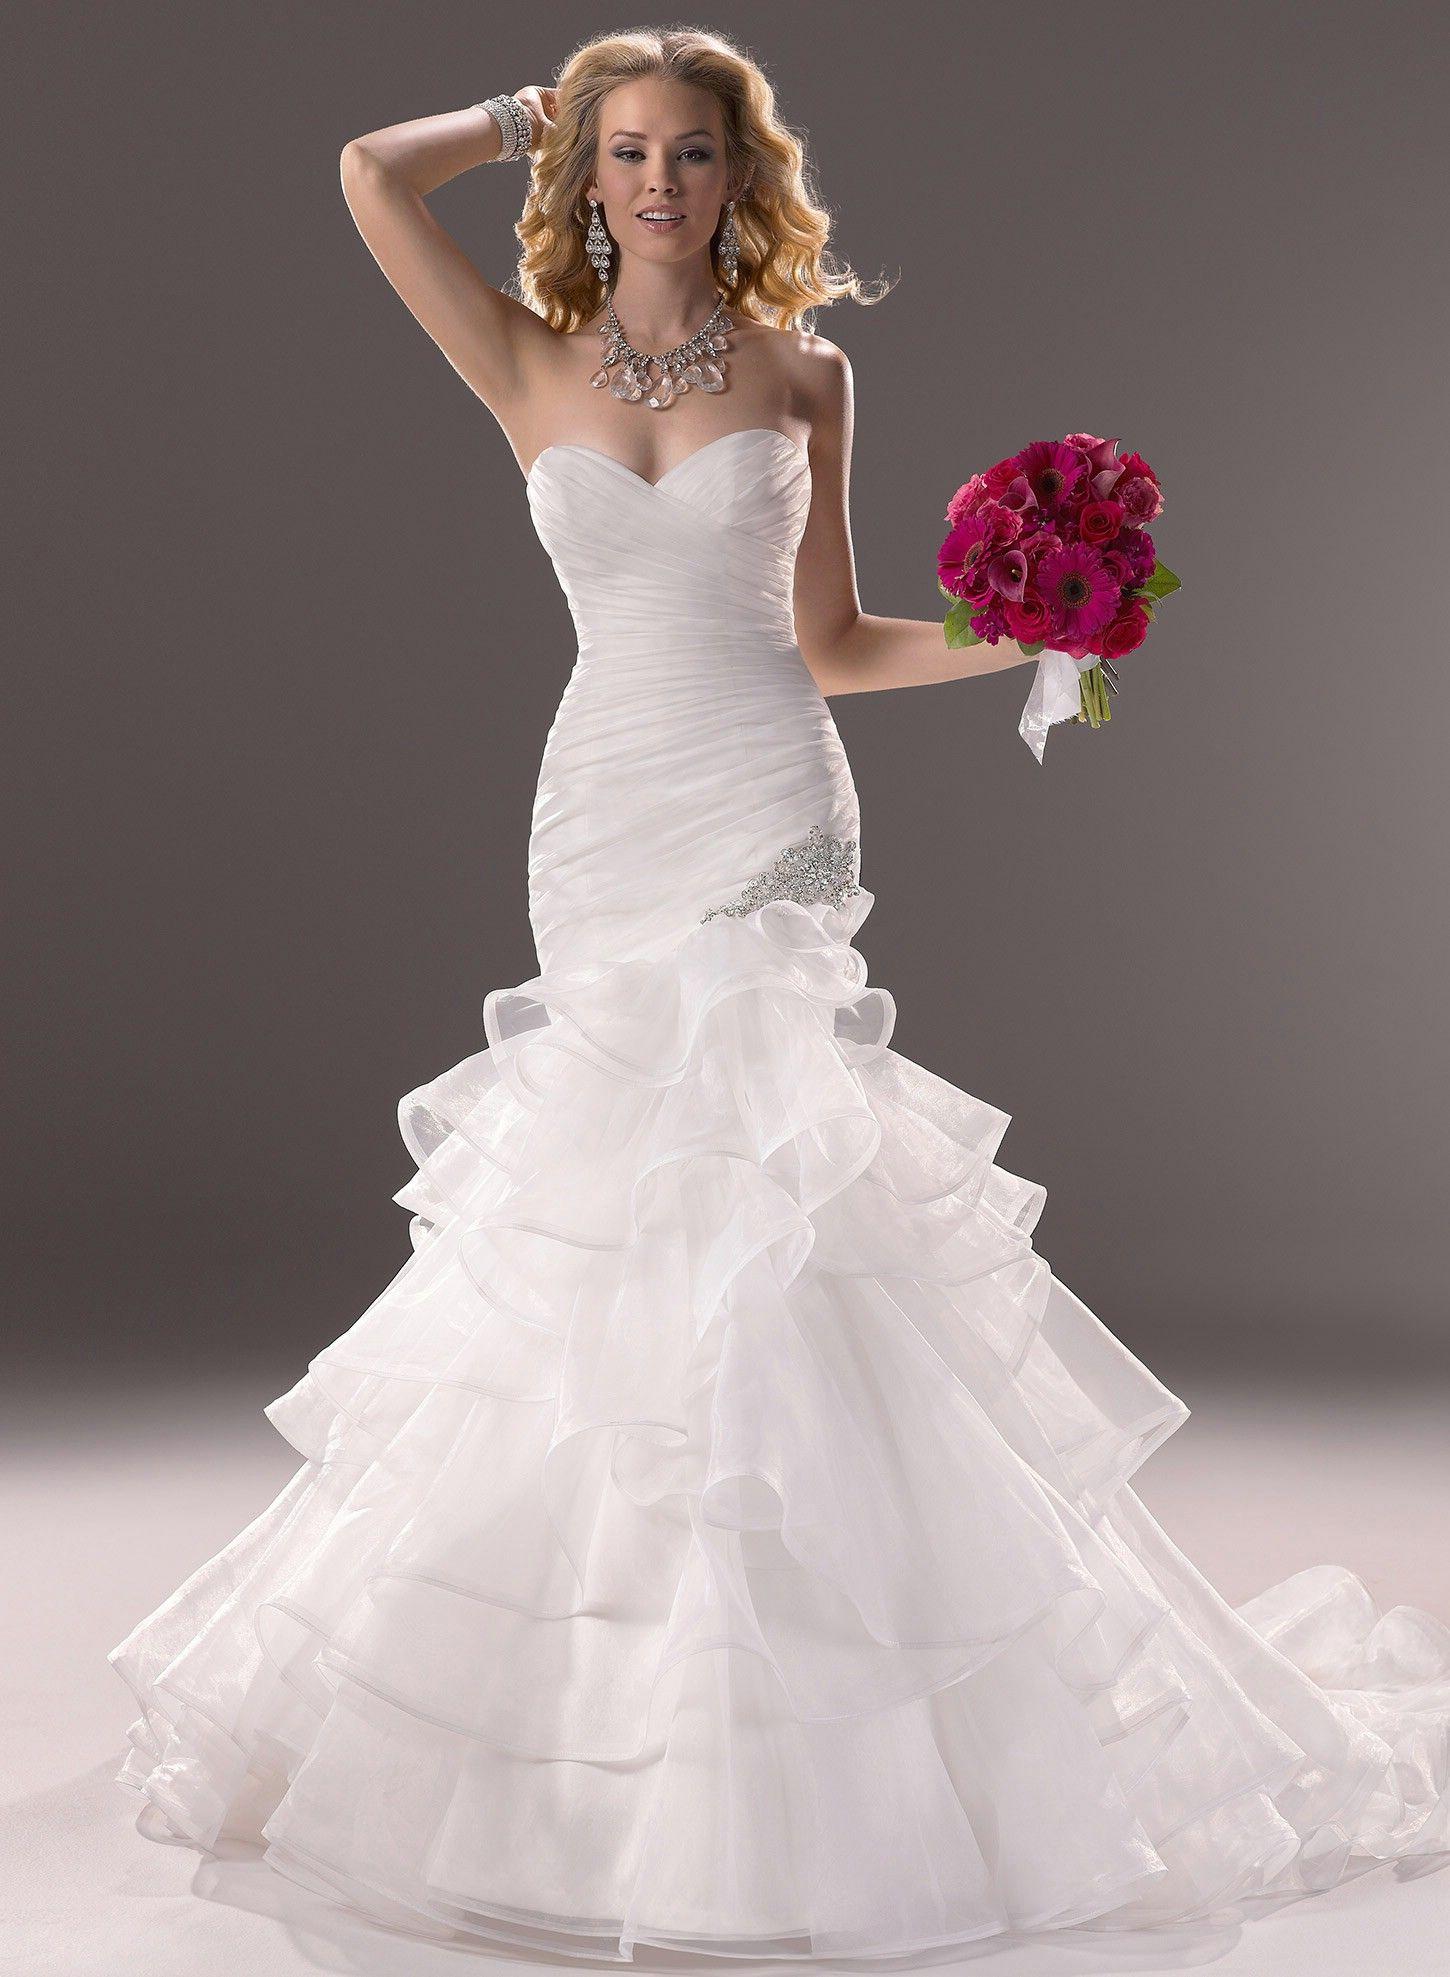 Wedding dresses styles  Maggie Sottero Wedding Dresses  Style Cheyenne MS  Mommmmmmaus